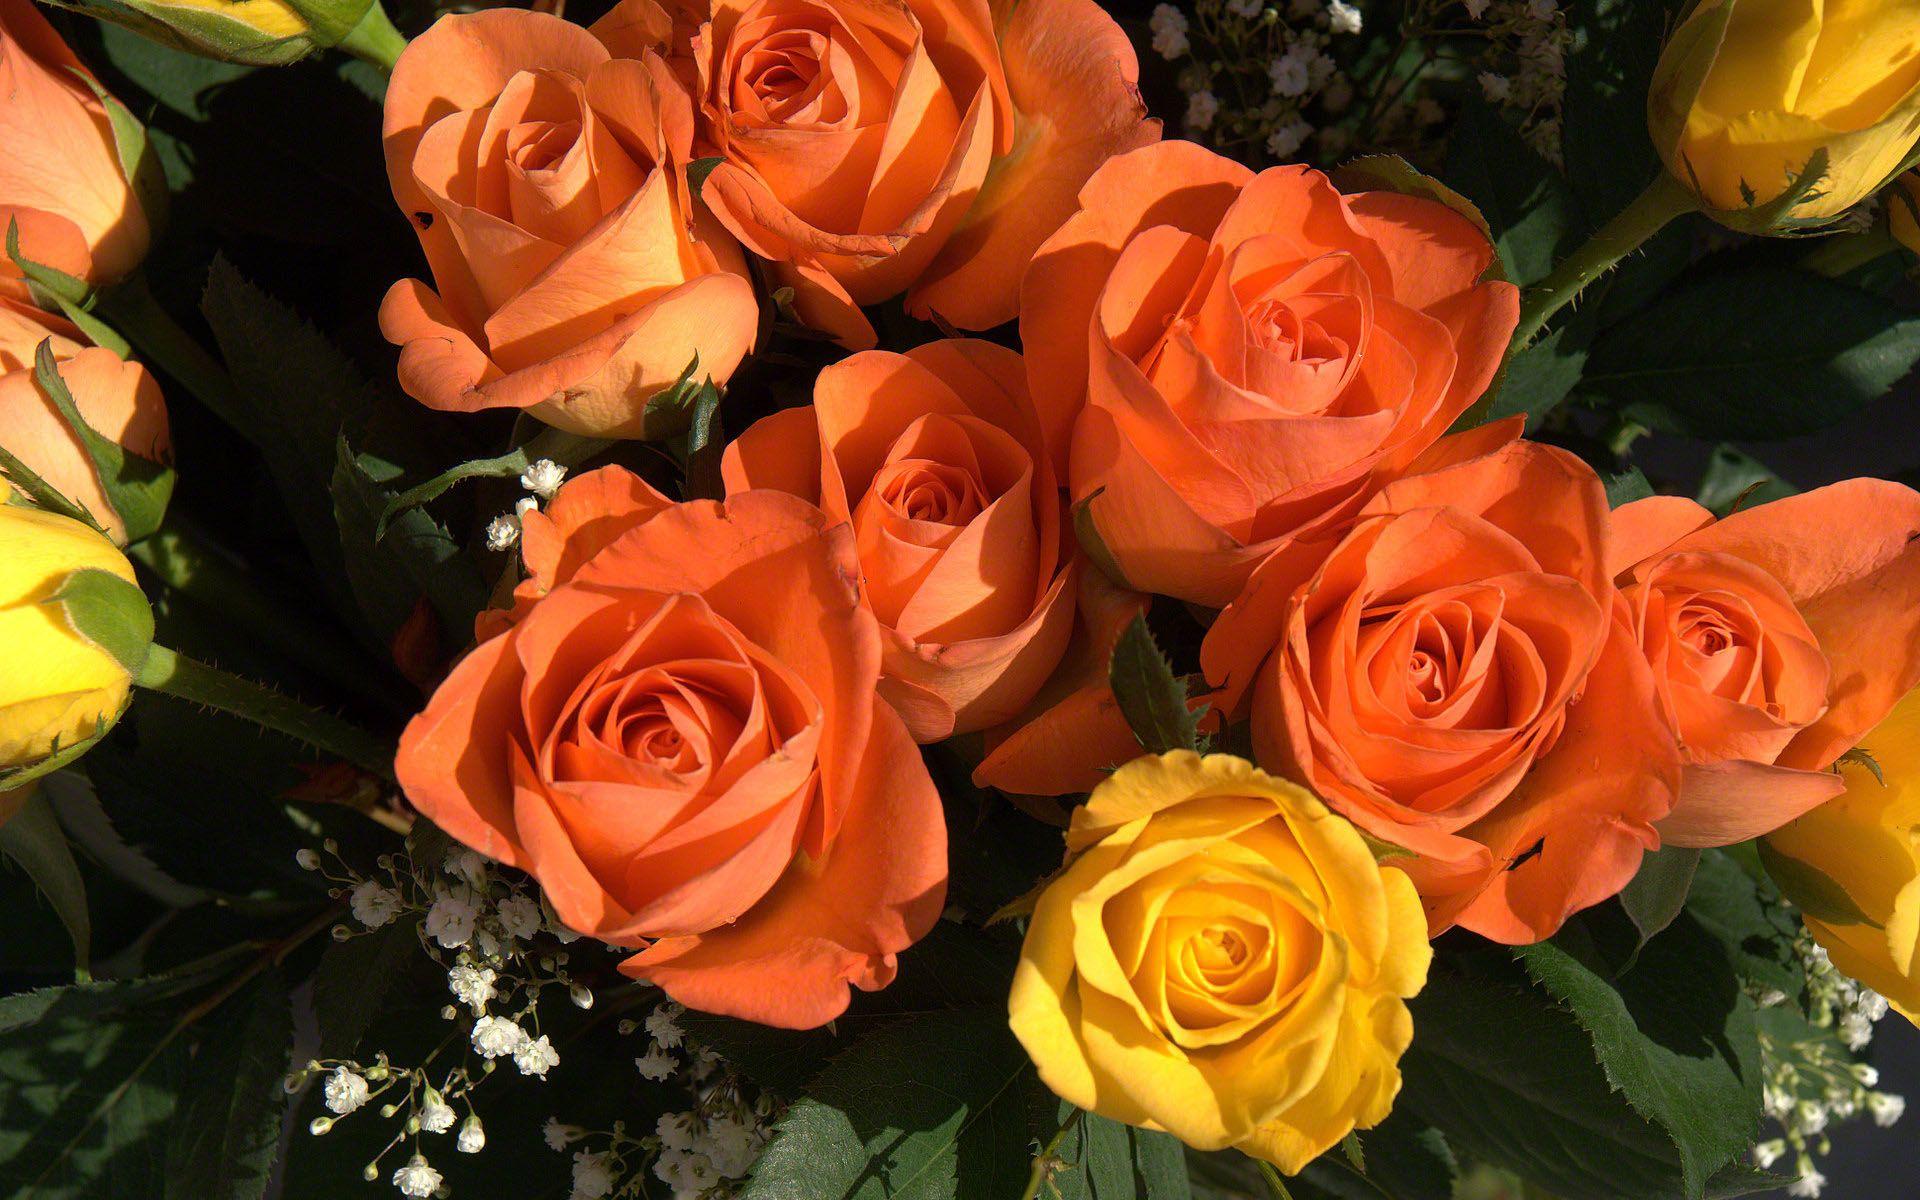 rose bouquet Wonderful flowers